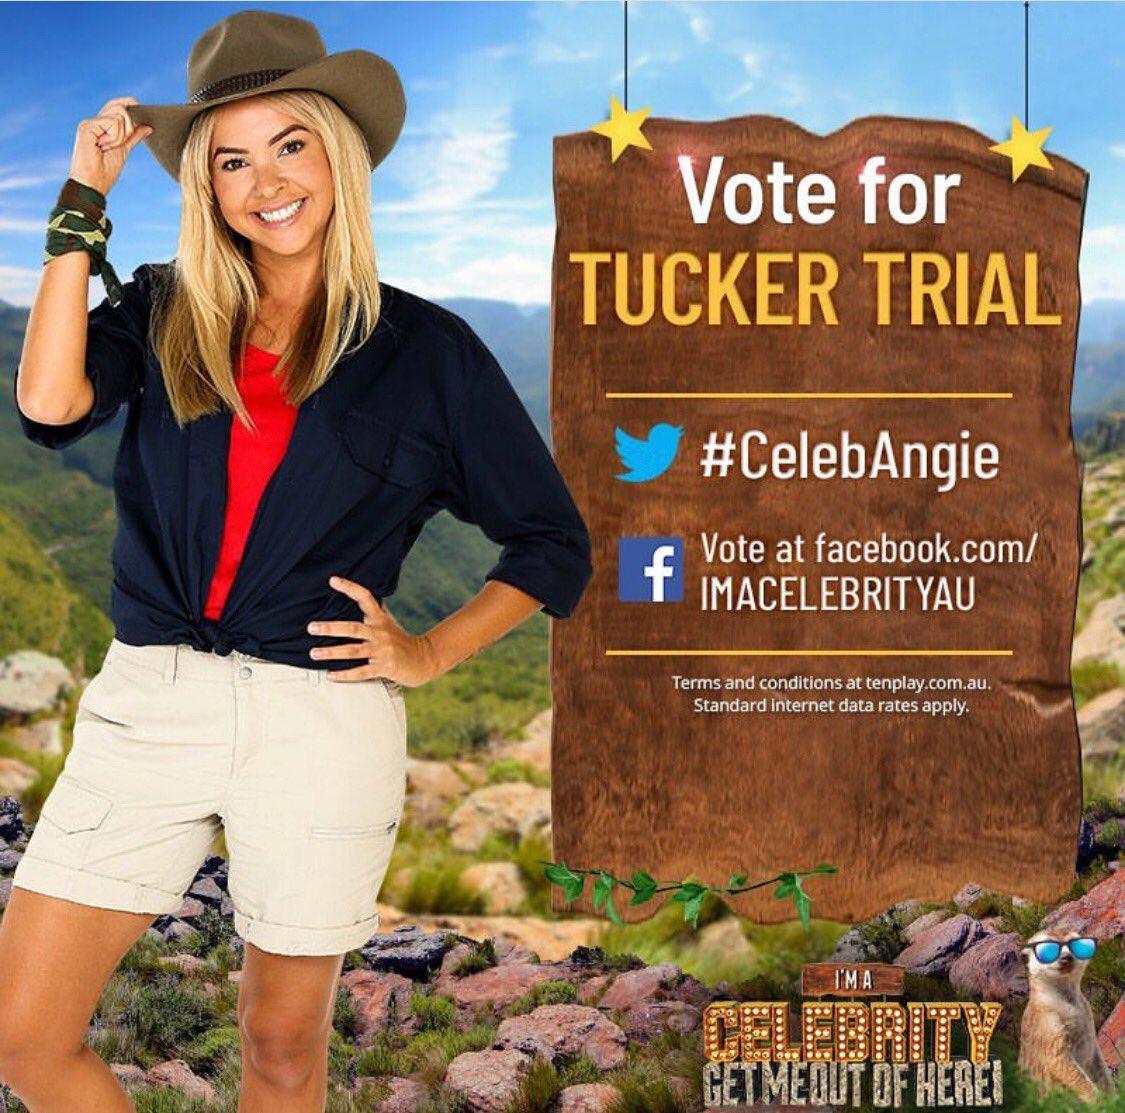 RT this to vote@Angiemkent into the next tucker trial! #CelebAngie